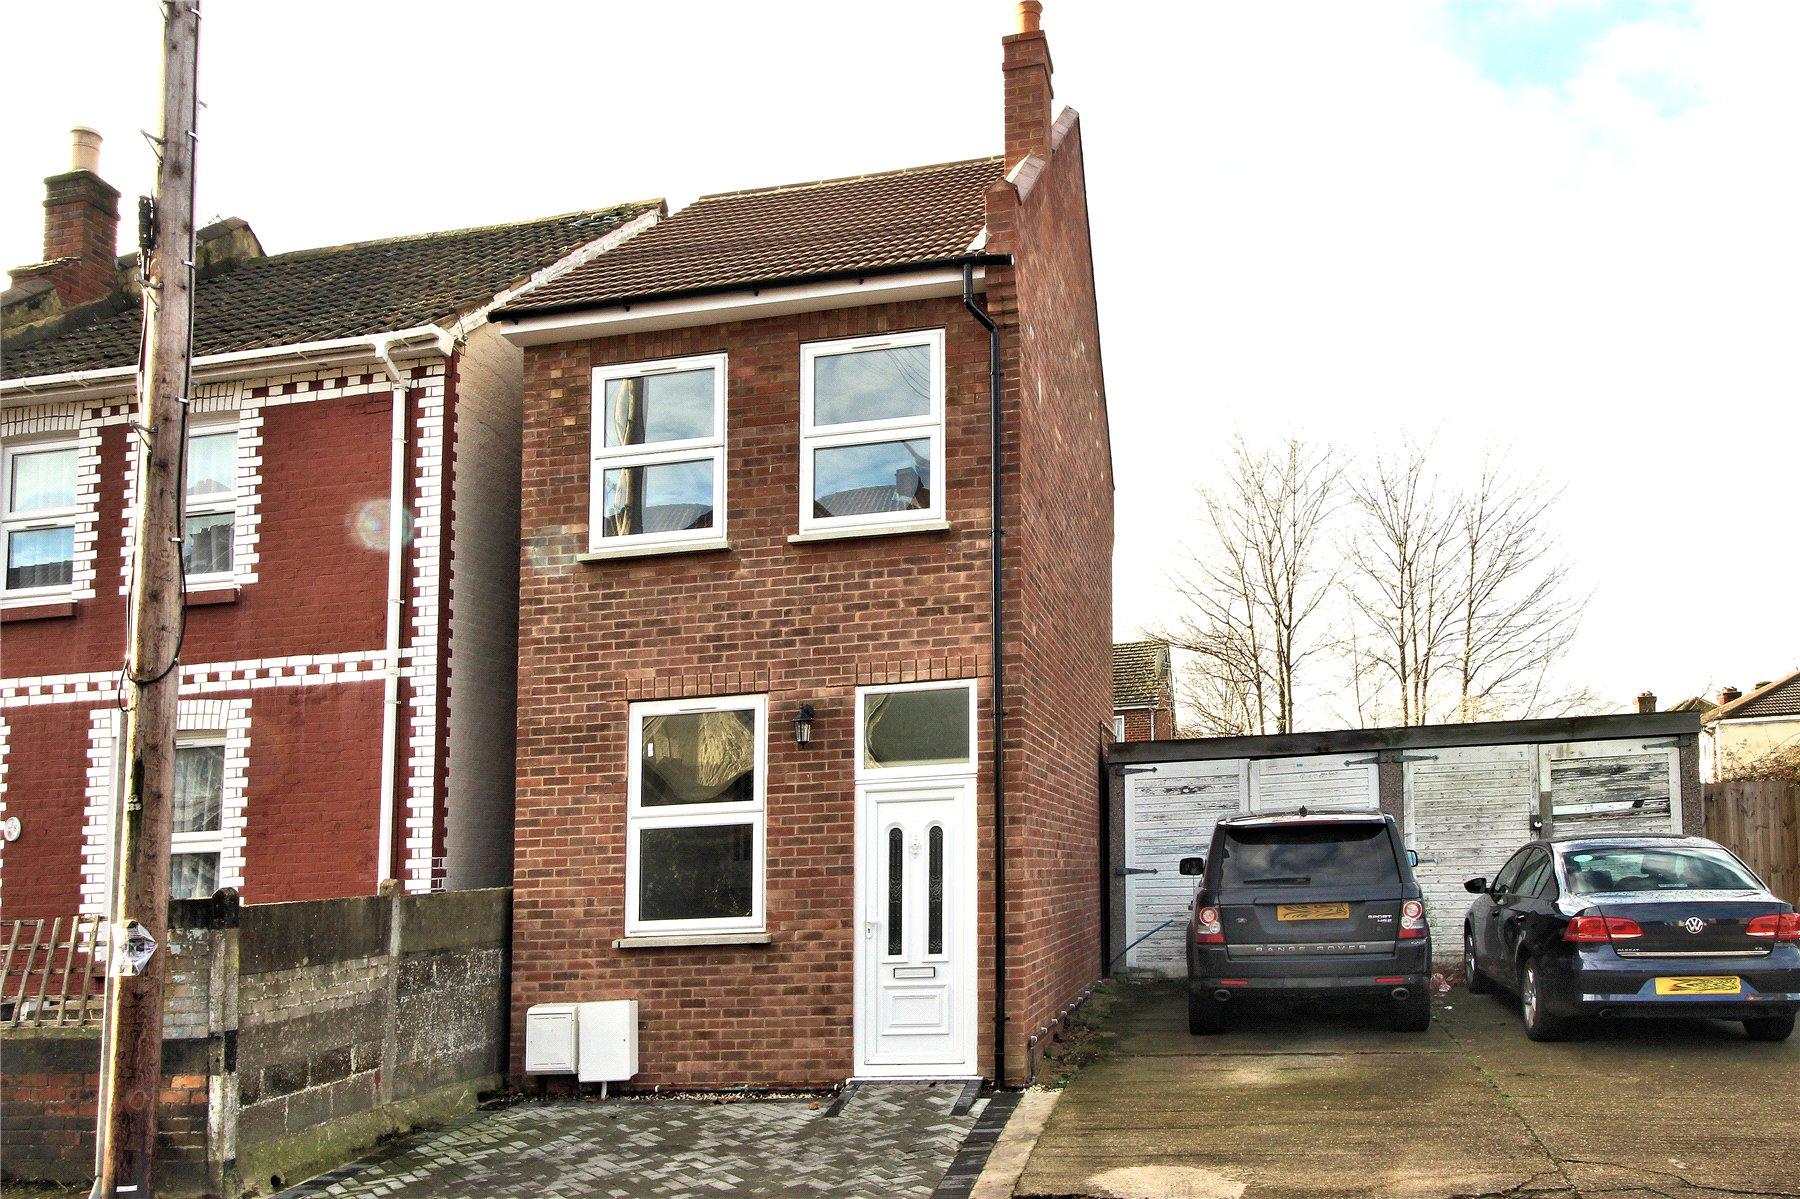 3 Bedrooms Detached House for sale in North Road, Woking, Surrey, GU21